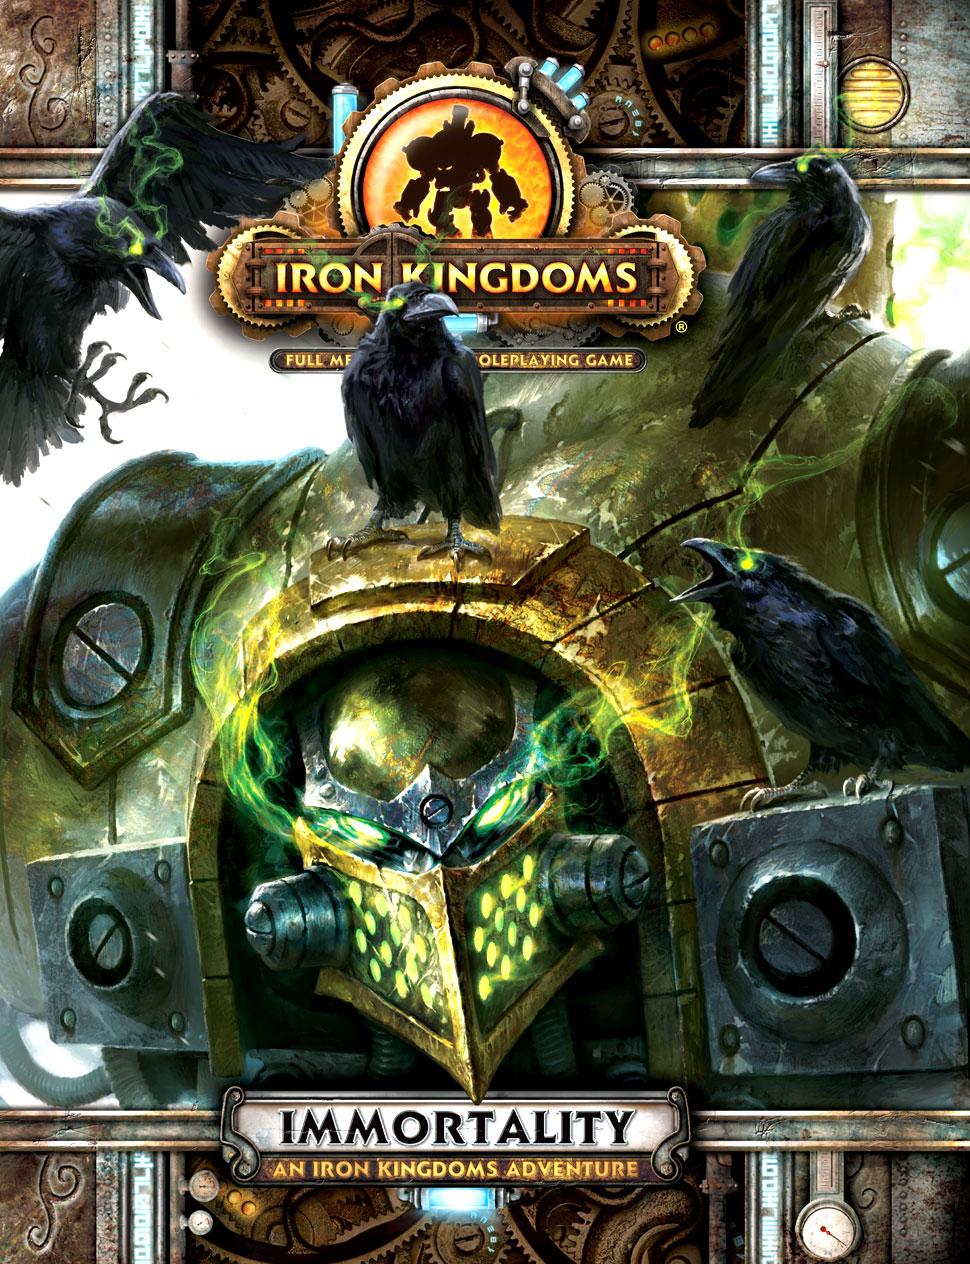 Iron Kingdoms Full Metal Fantasy Rpg: Immortality - An Iron Kingdoms Adventure Box Front